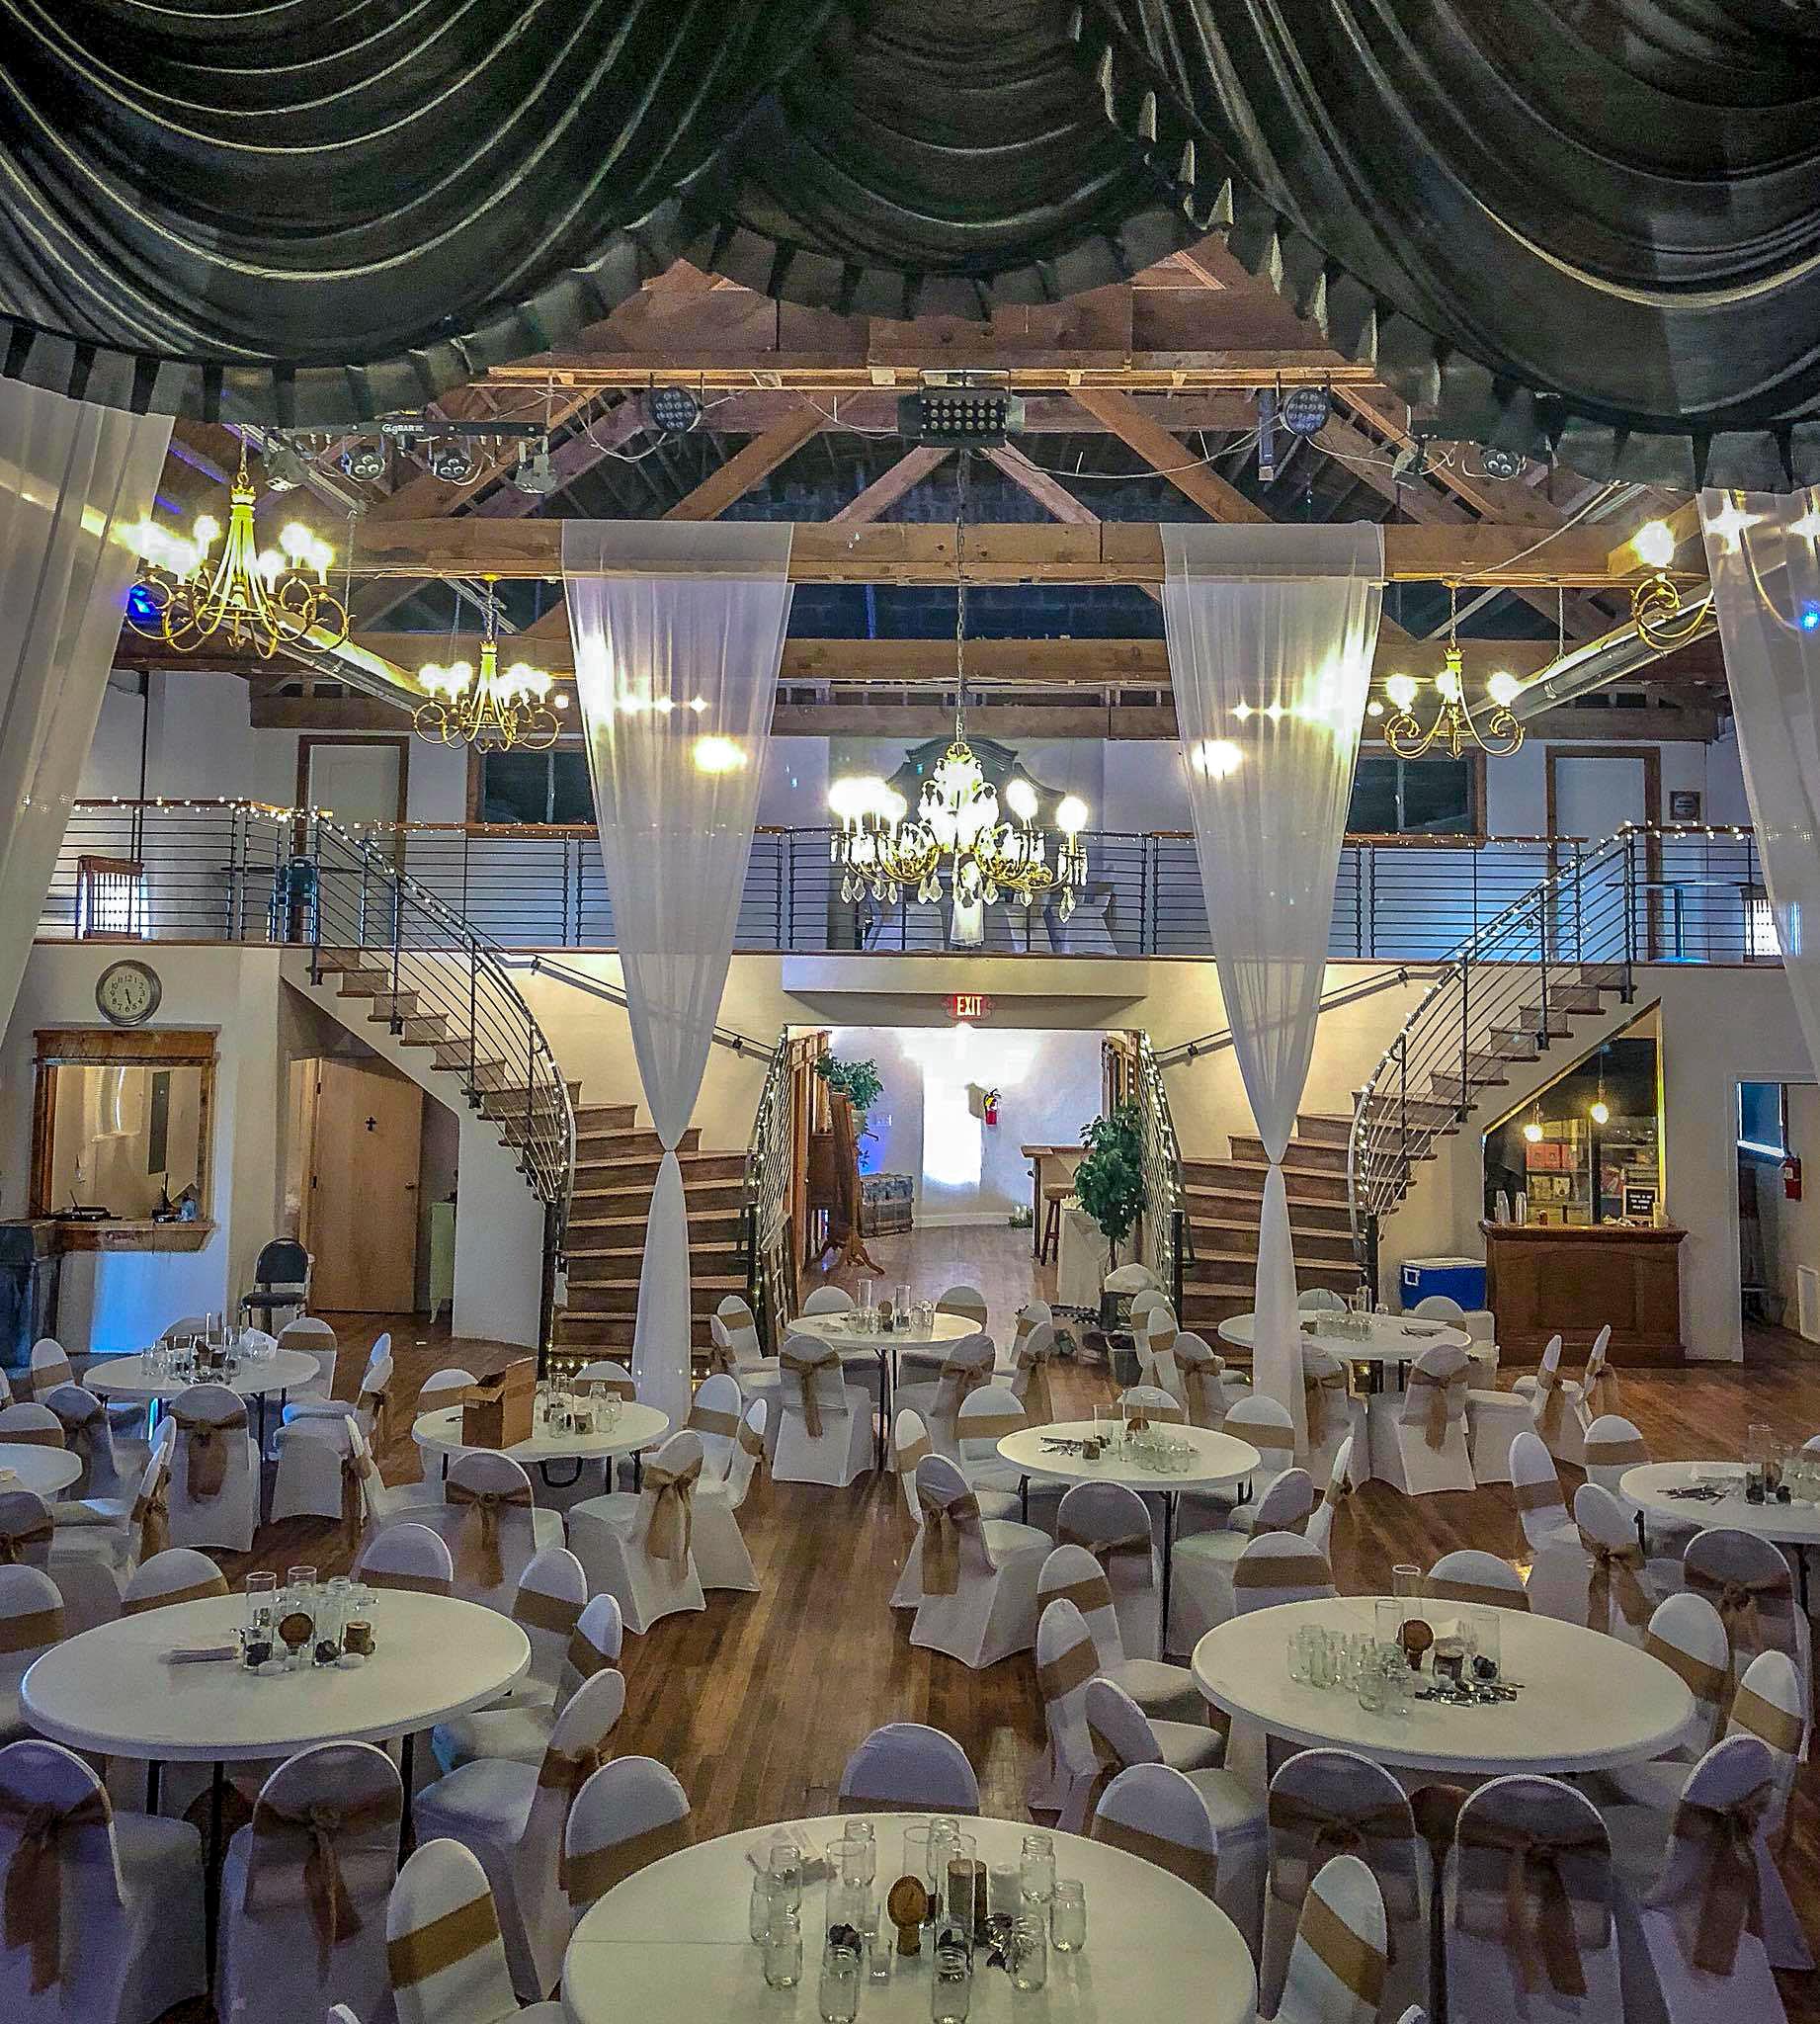 The Loft Theater wedding receptions